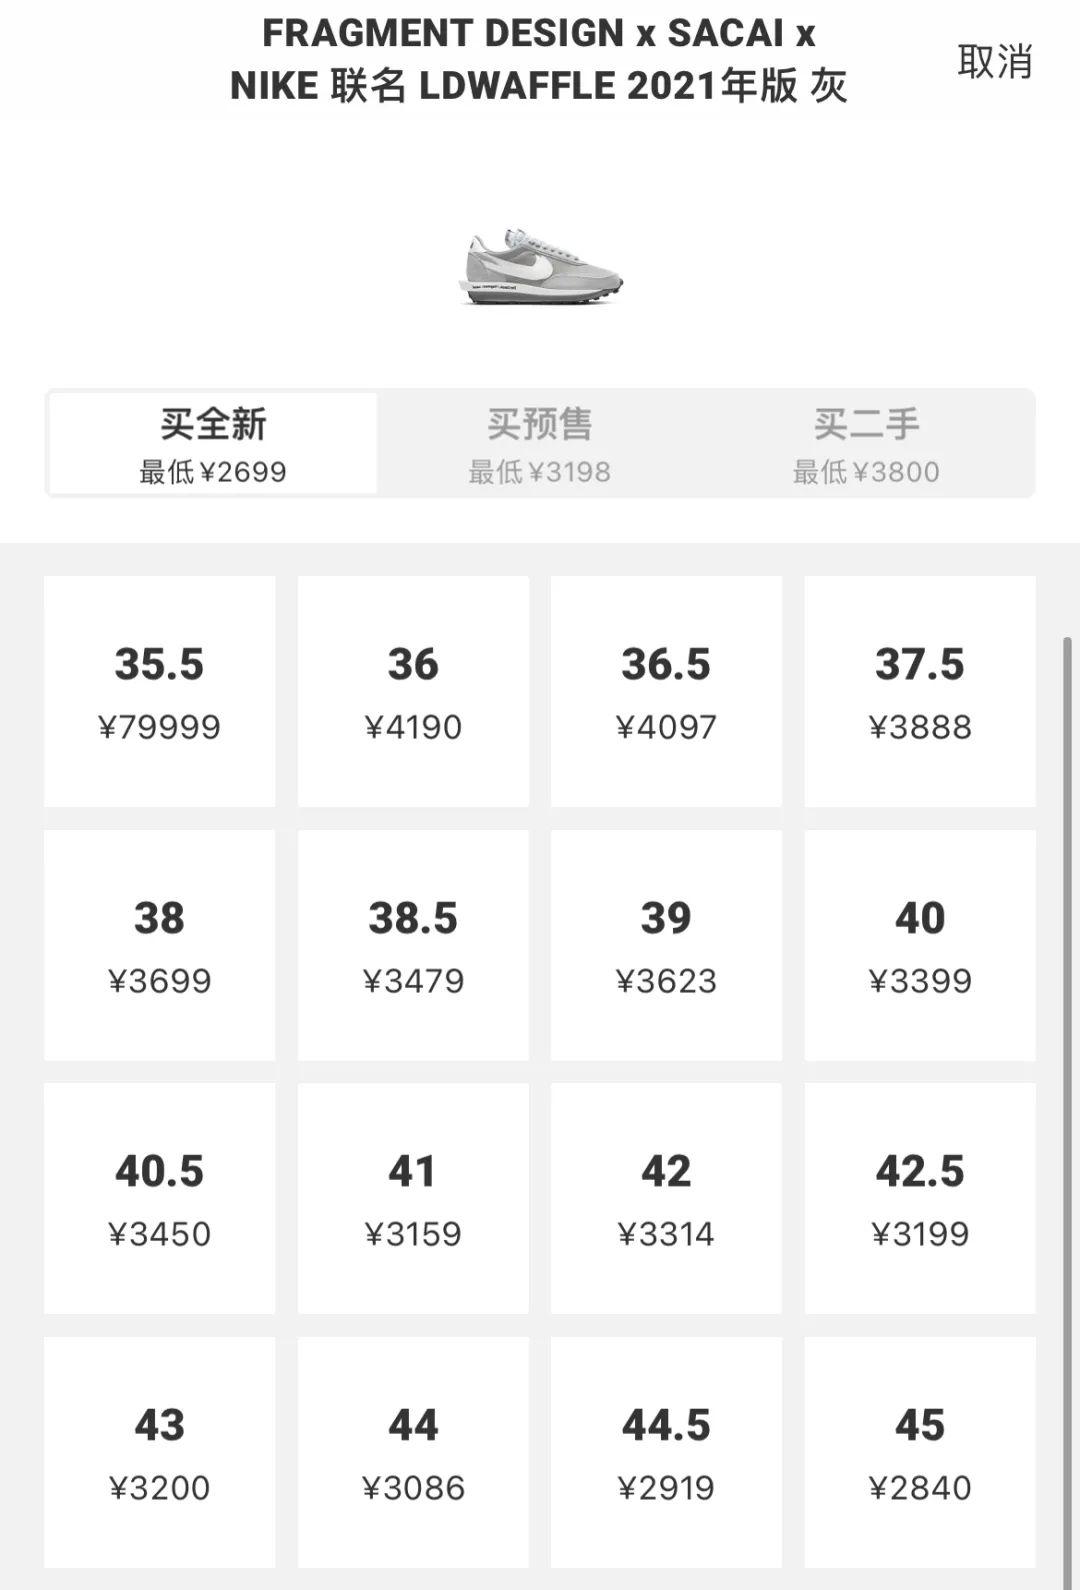 Snkrs发售预警!sacai x 藤原浩 x 耐克联名又上架抢购,附链接!